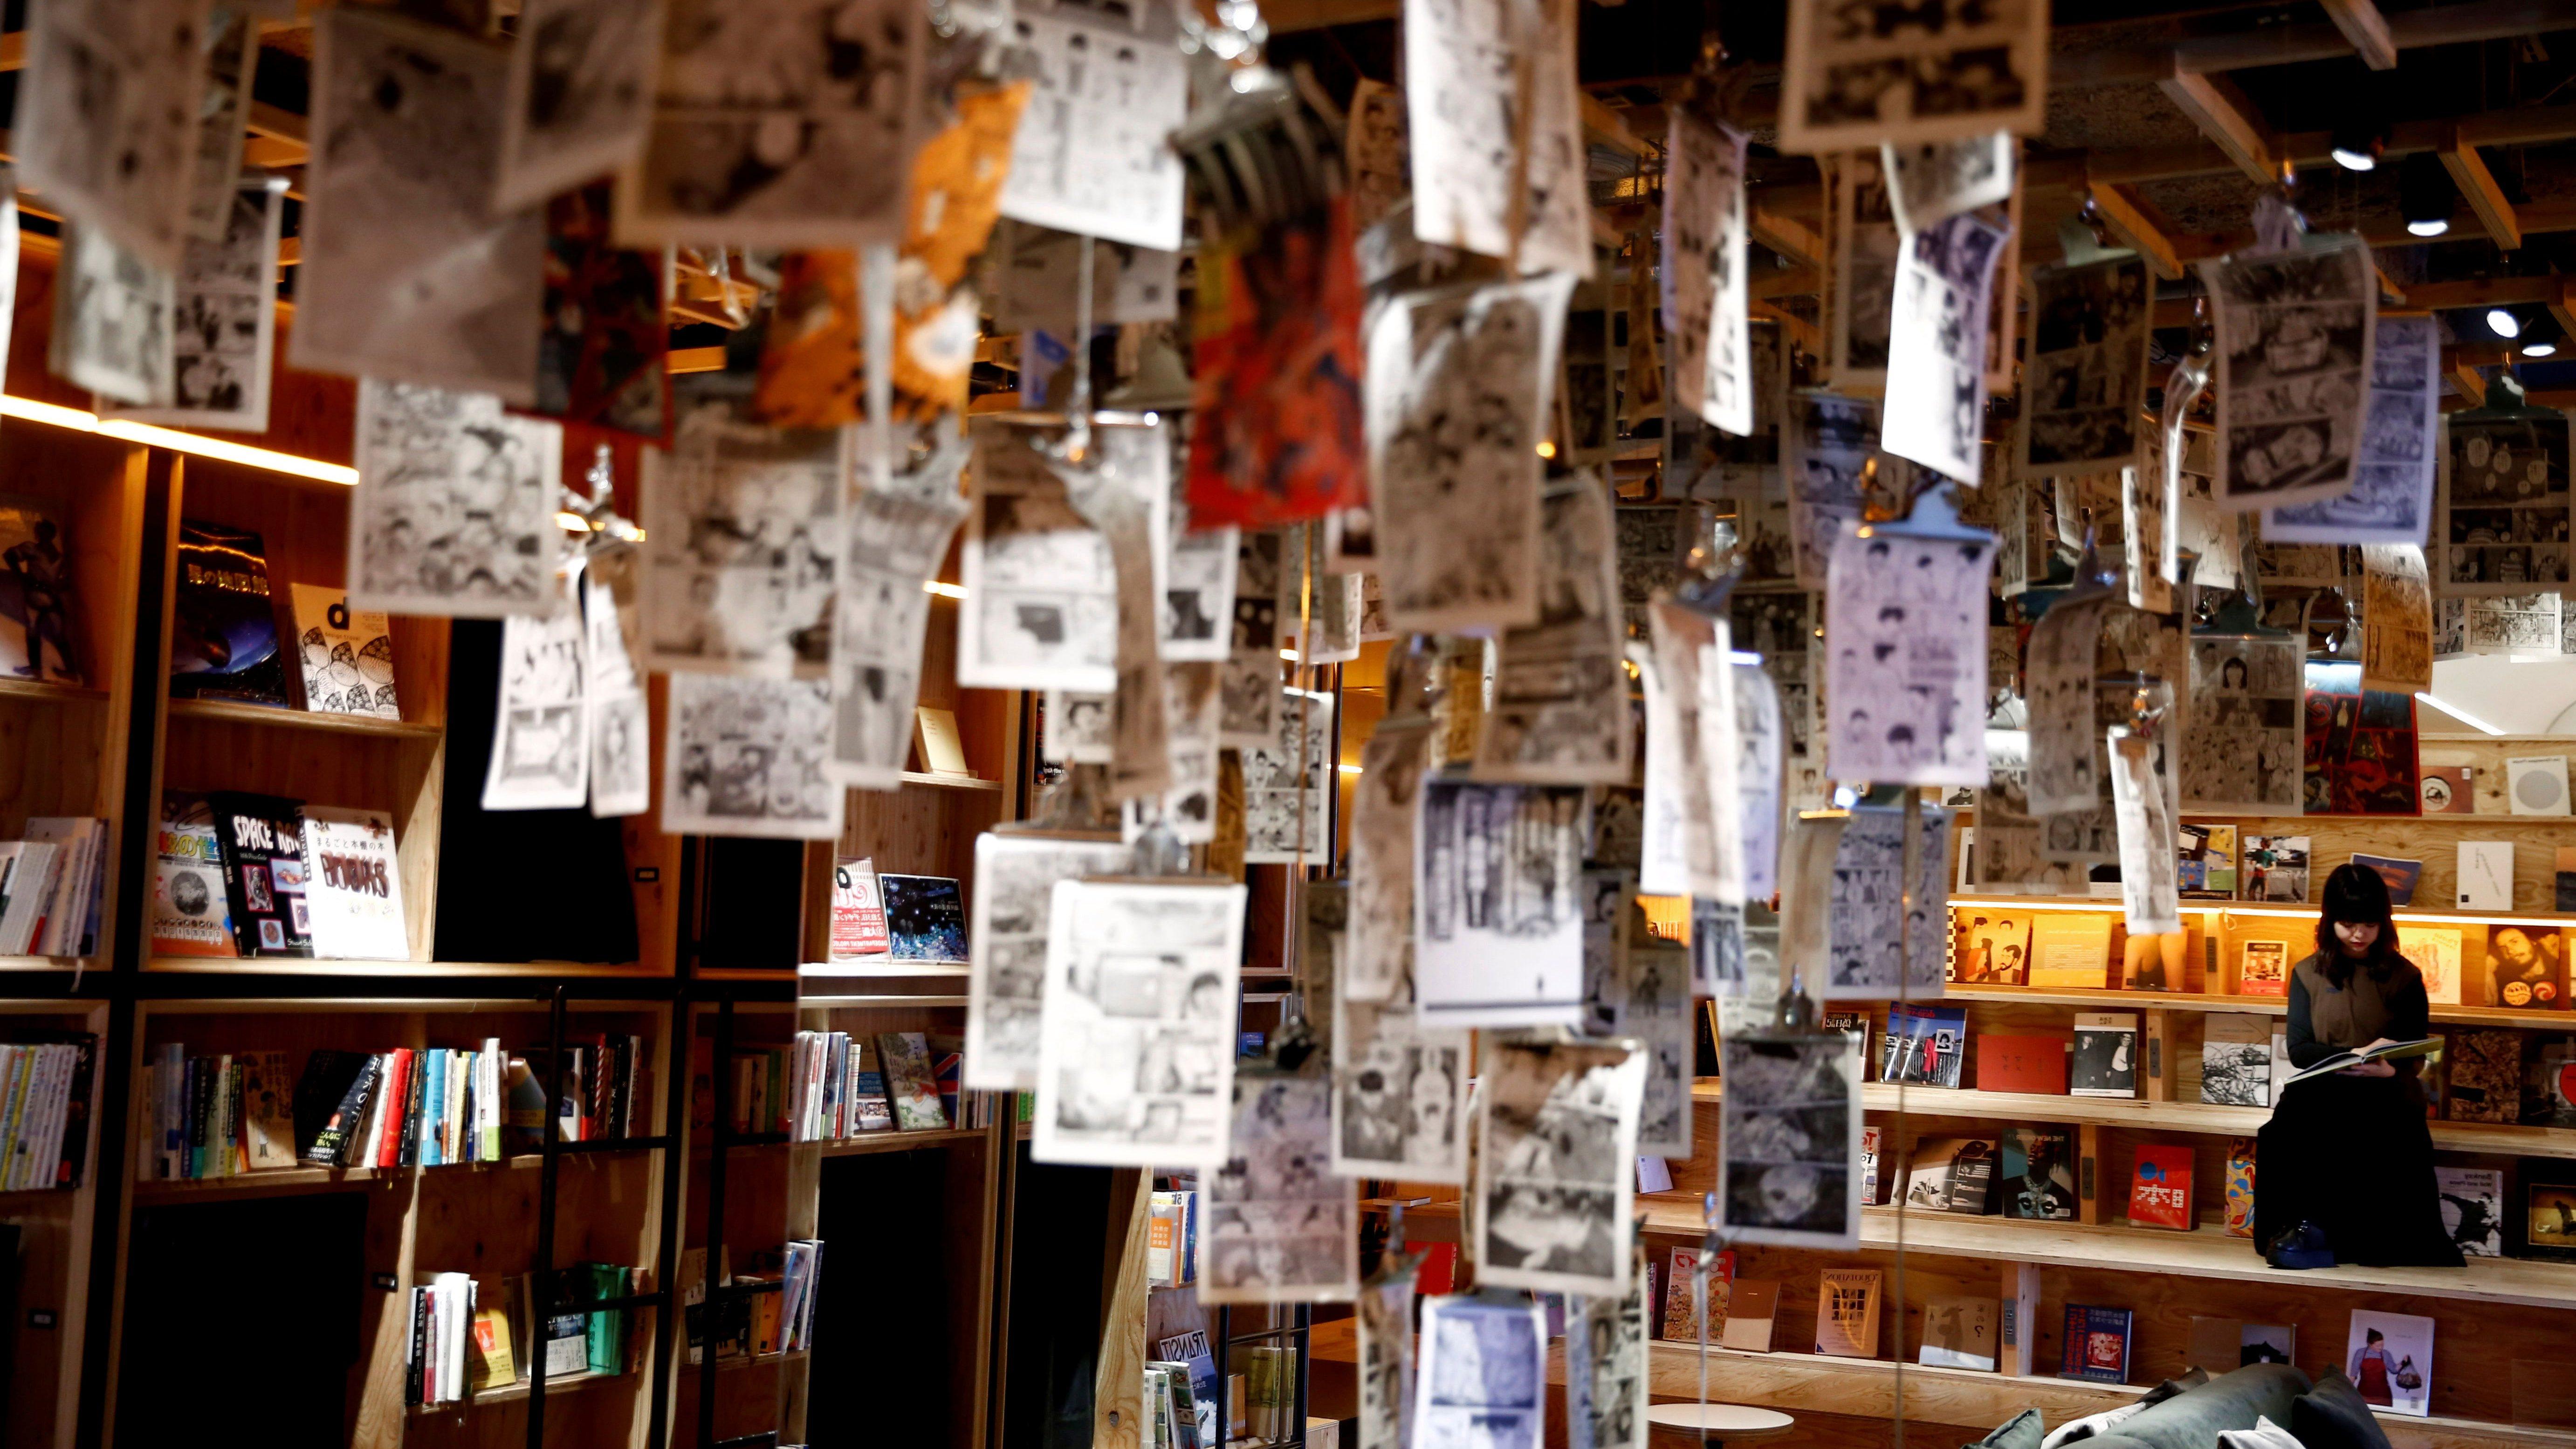 The Man Booker International Prize 2019 shortlist announced